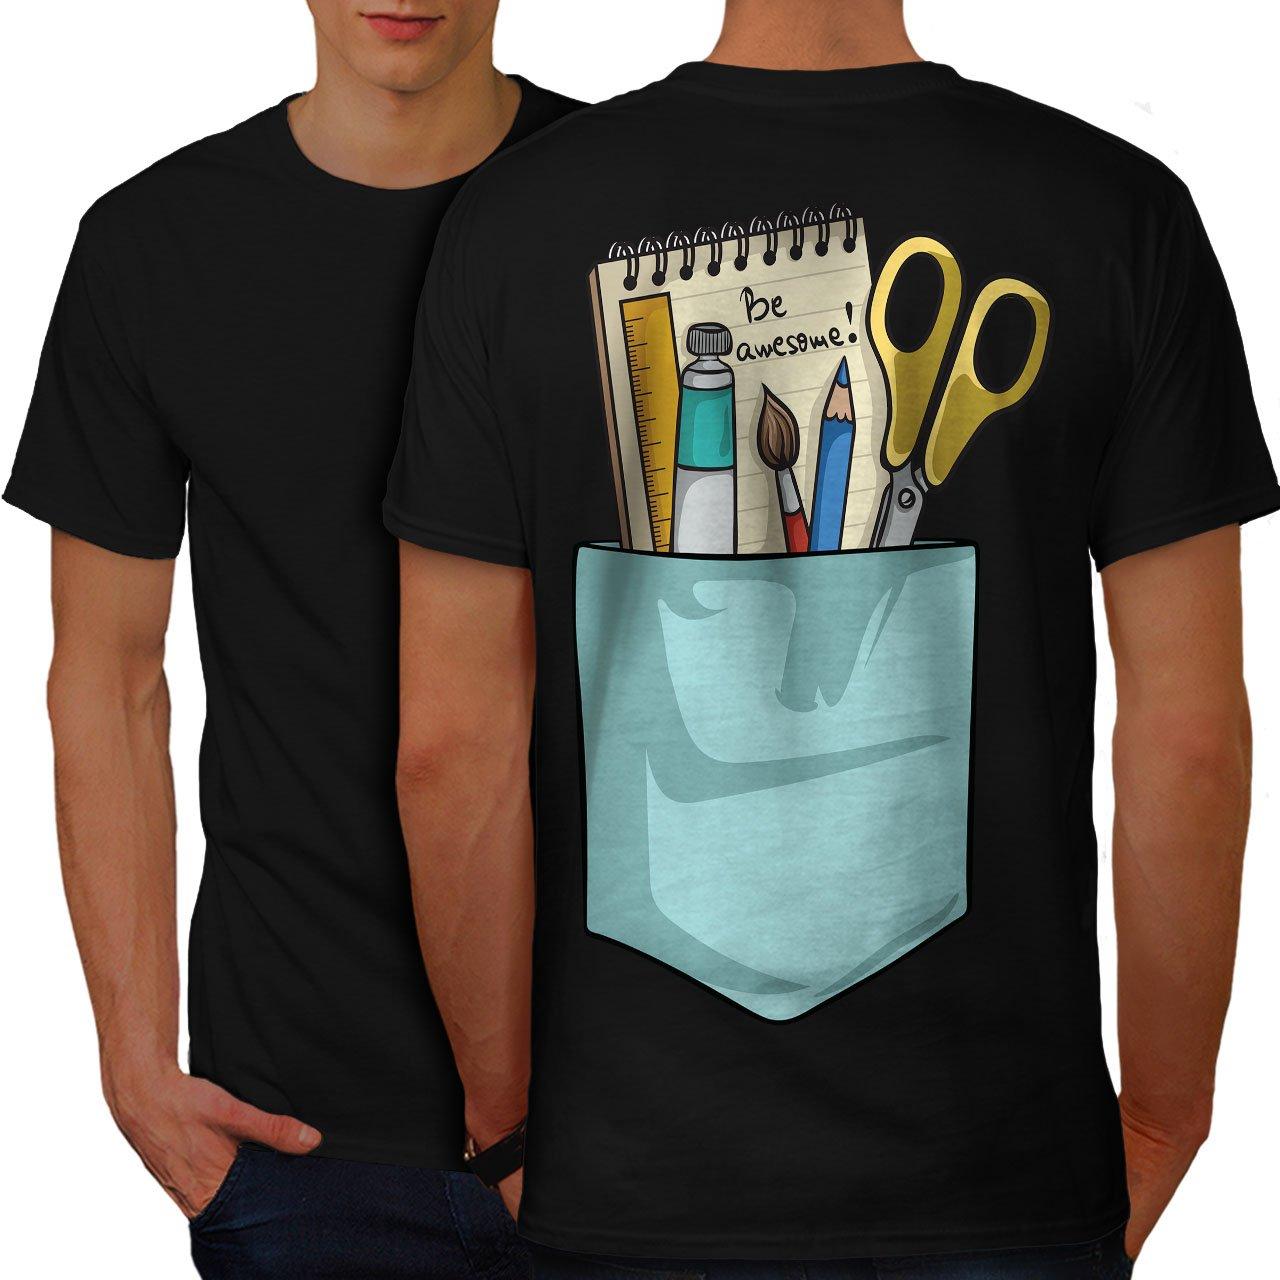 03ed9168 Amazon.com: wellcoda Artist Designer Funny Mens T-Shirt, Design Print on  The Back: Clothing